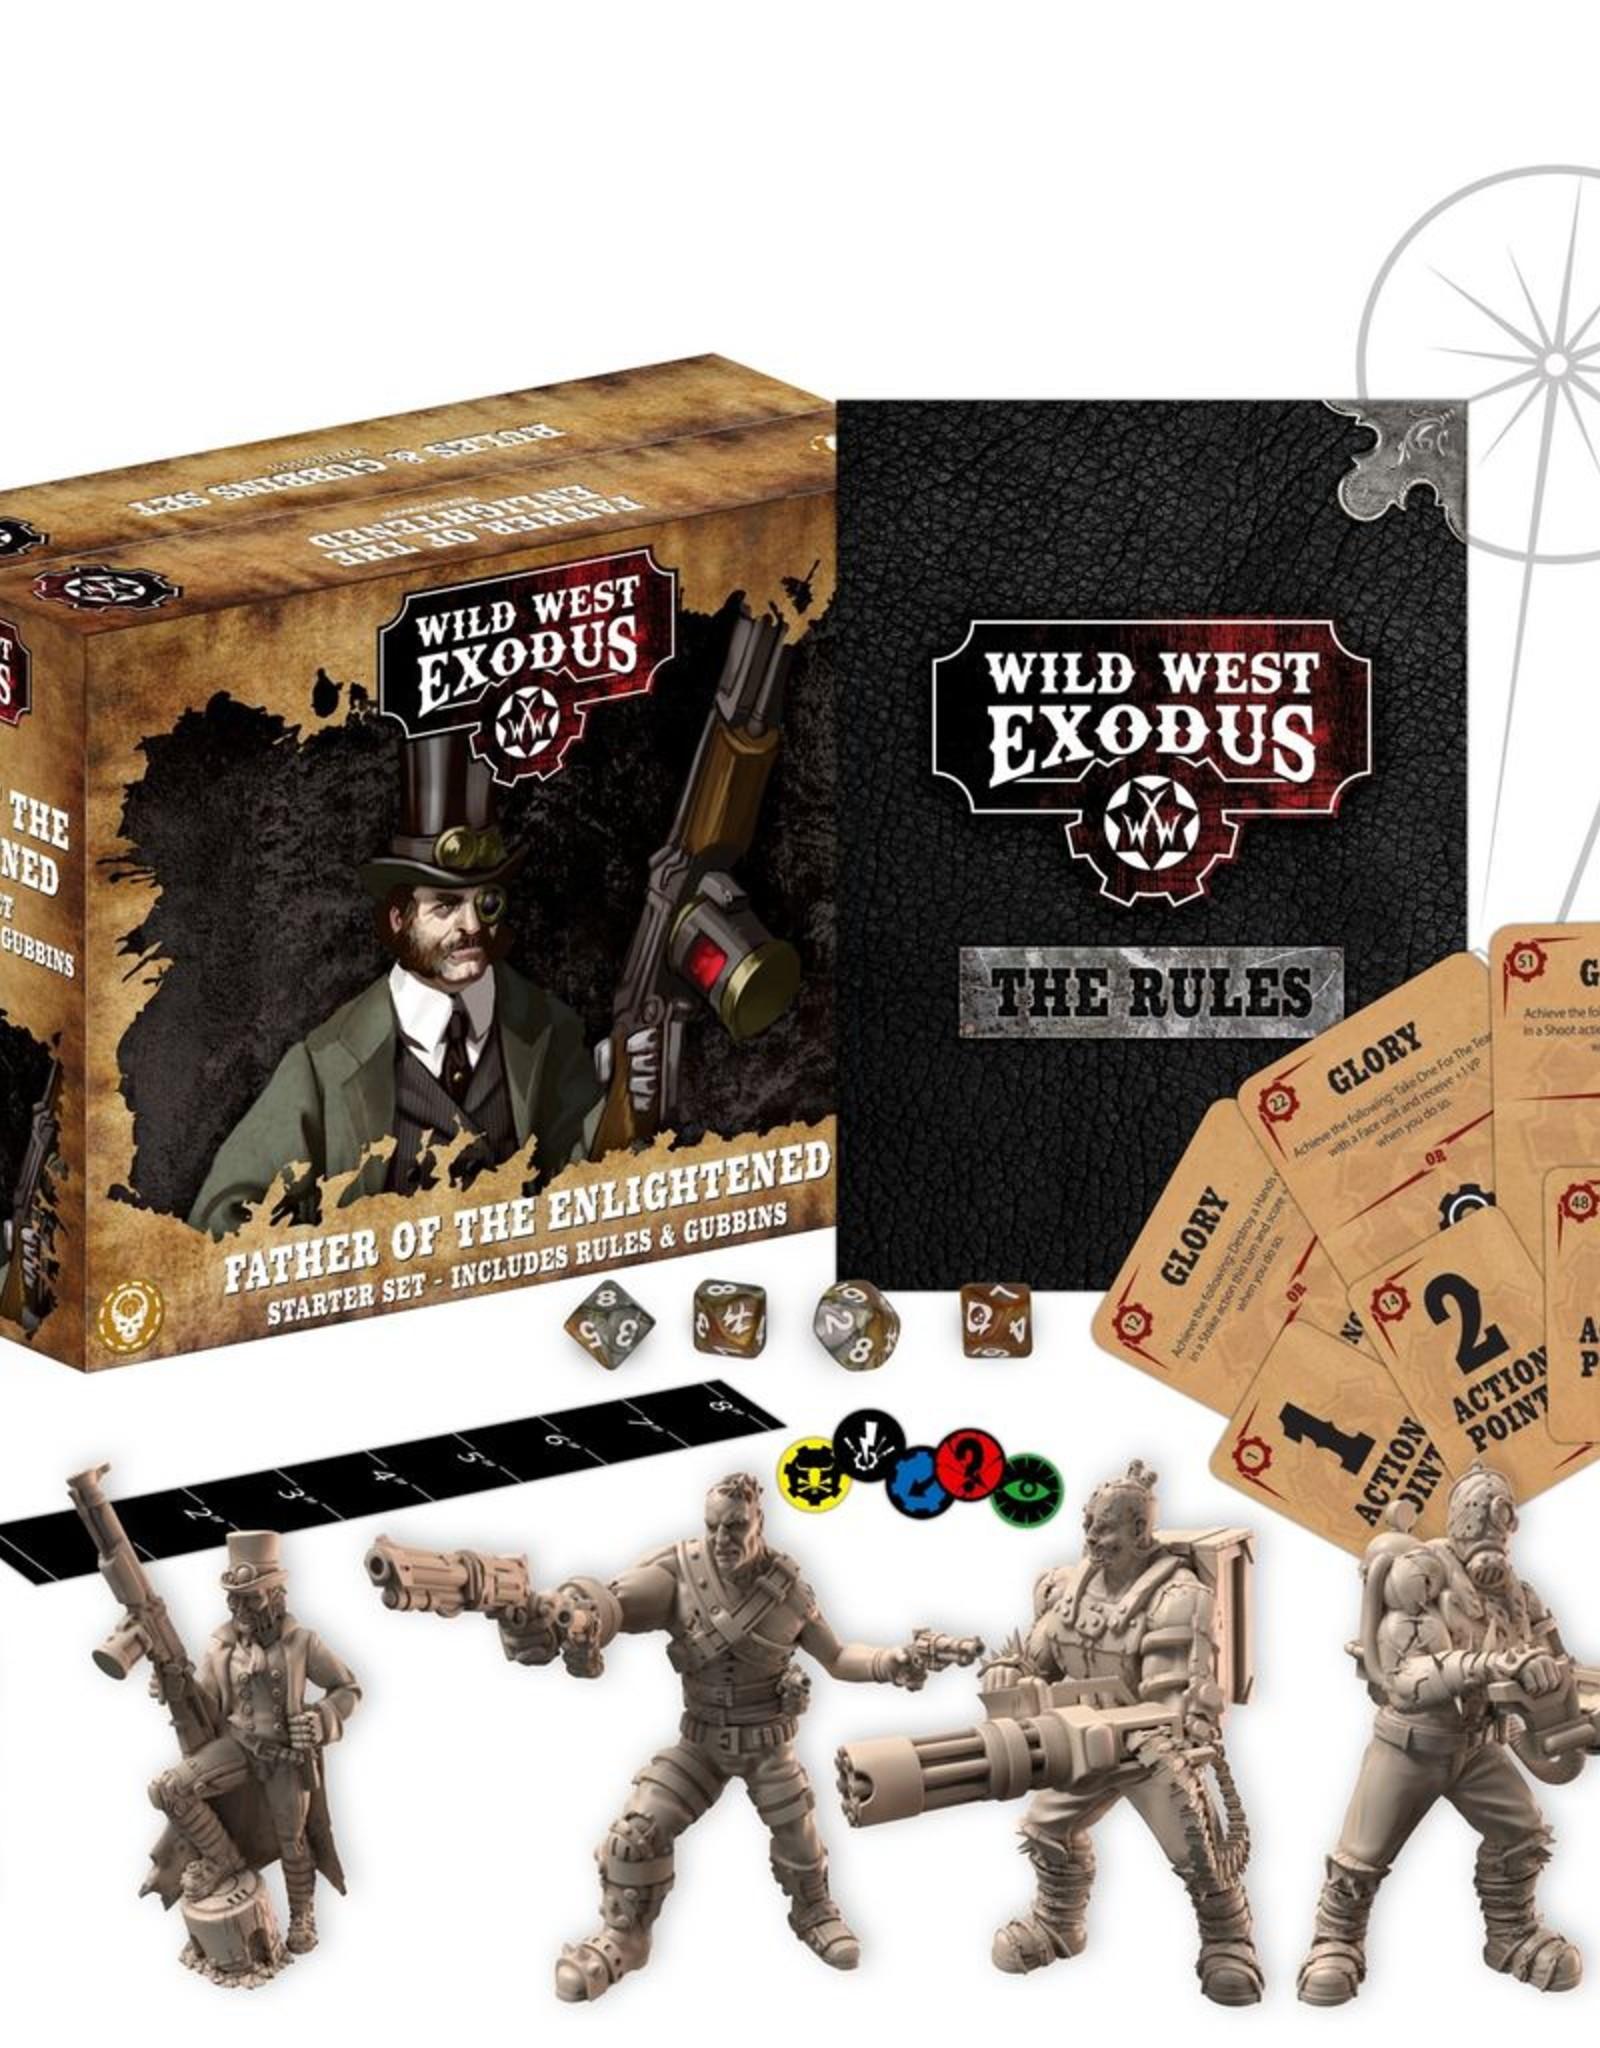 WEX - Wild West Exodus Miniaturen Father of the Enlightened Starter Set